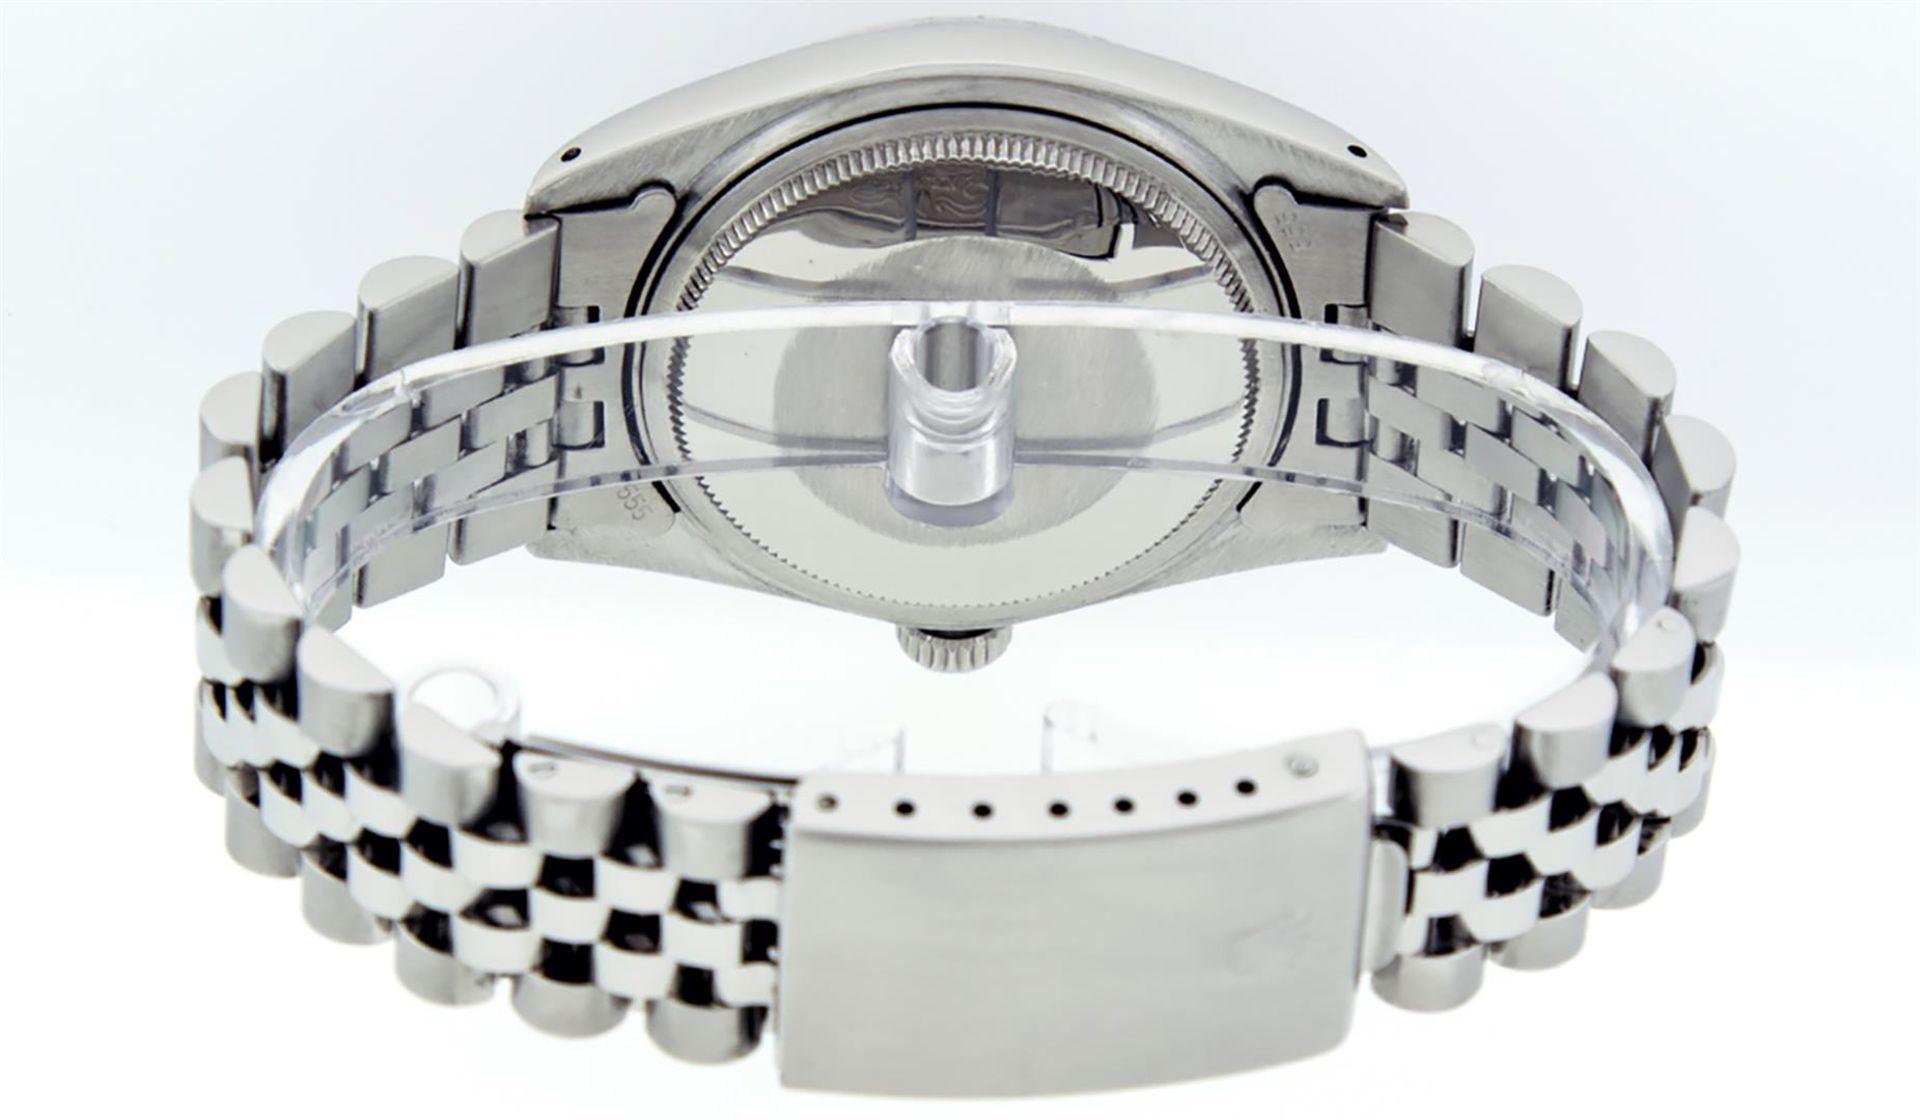 Rolex Mens Stainless Black Diamond 36MM Datejust Wristwatch - Image 2 of 9